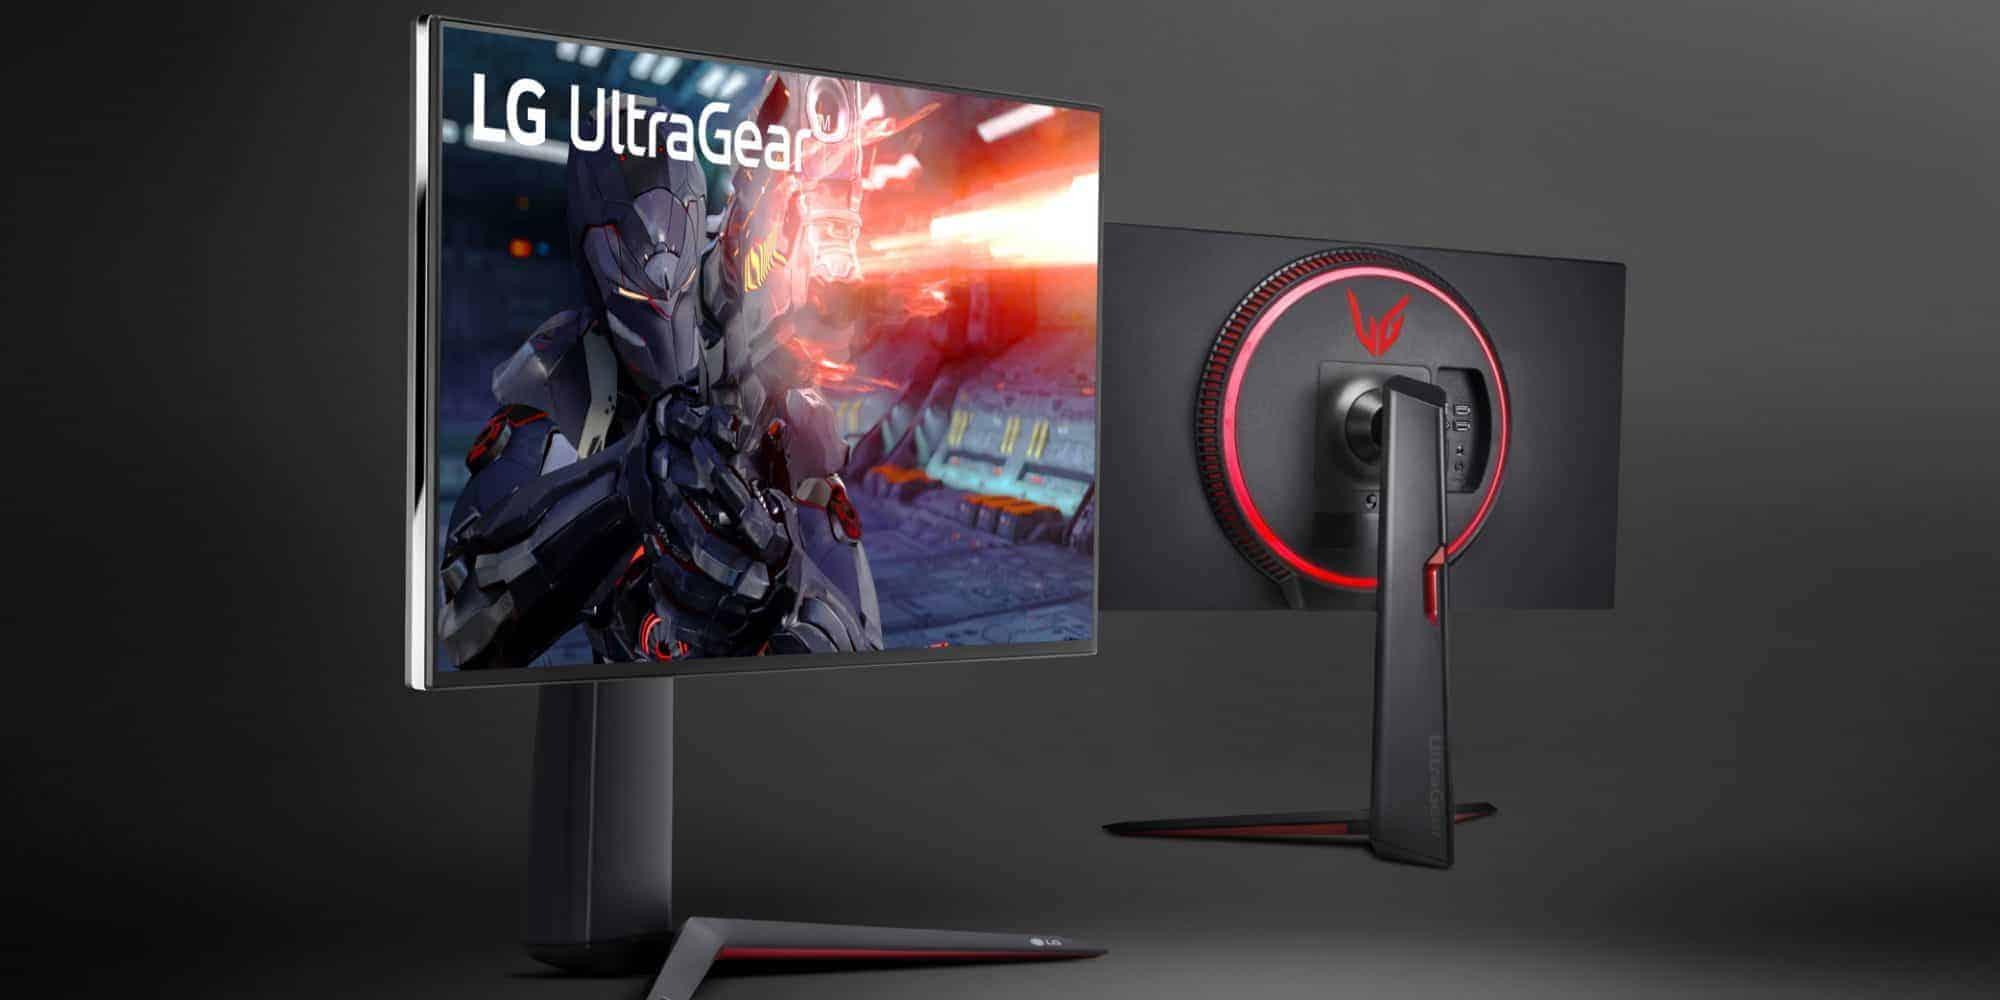 LG anuncia o seu primeiro monitor UltraGear 4K | MaisTecnologia